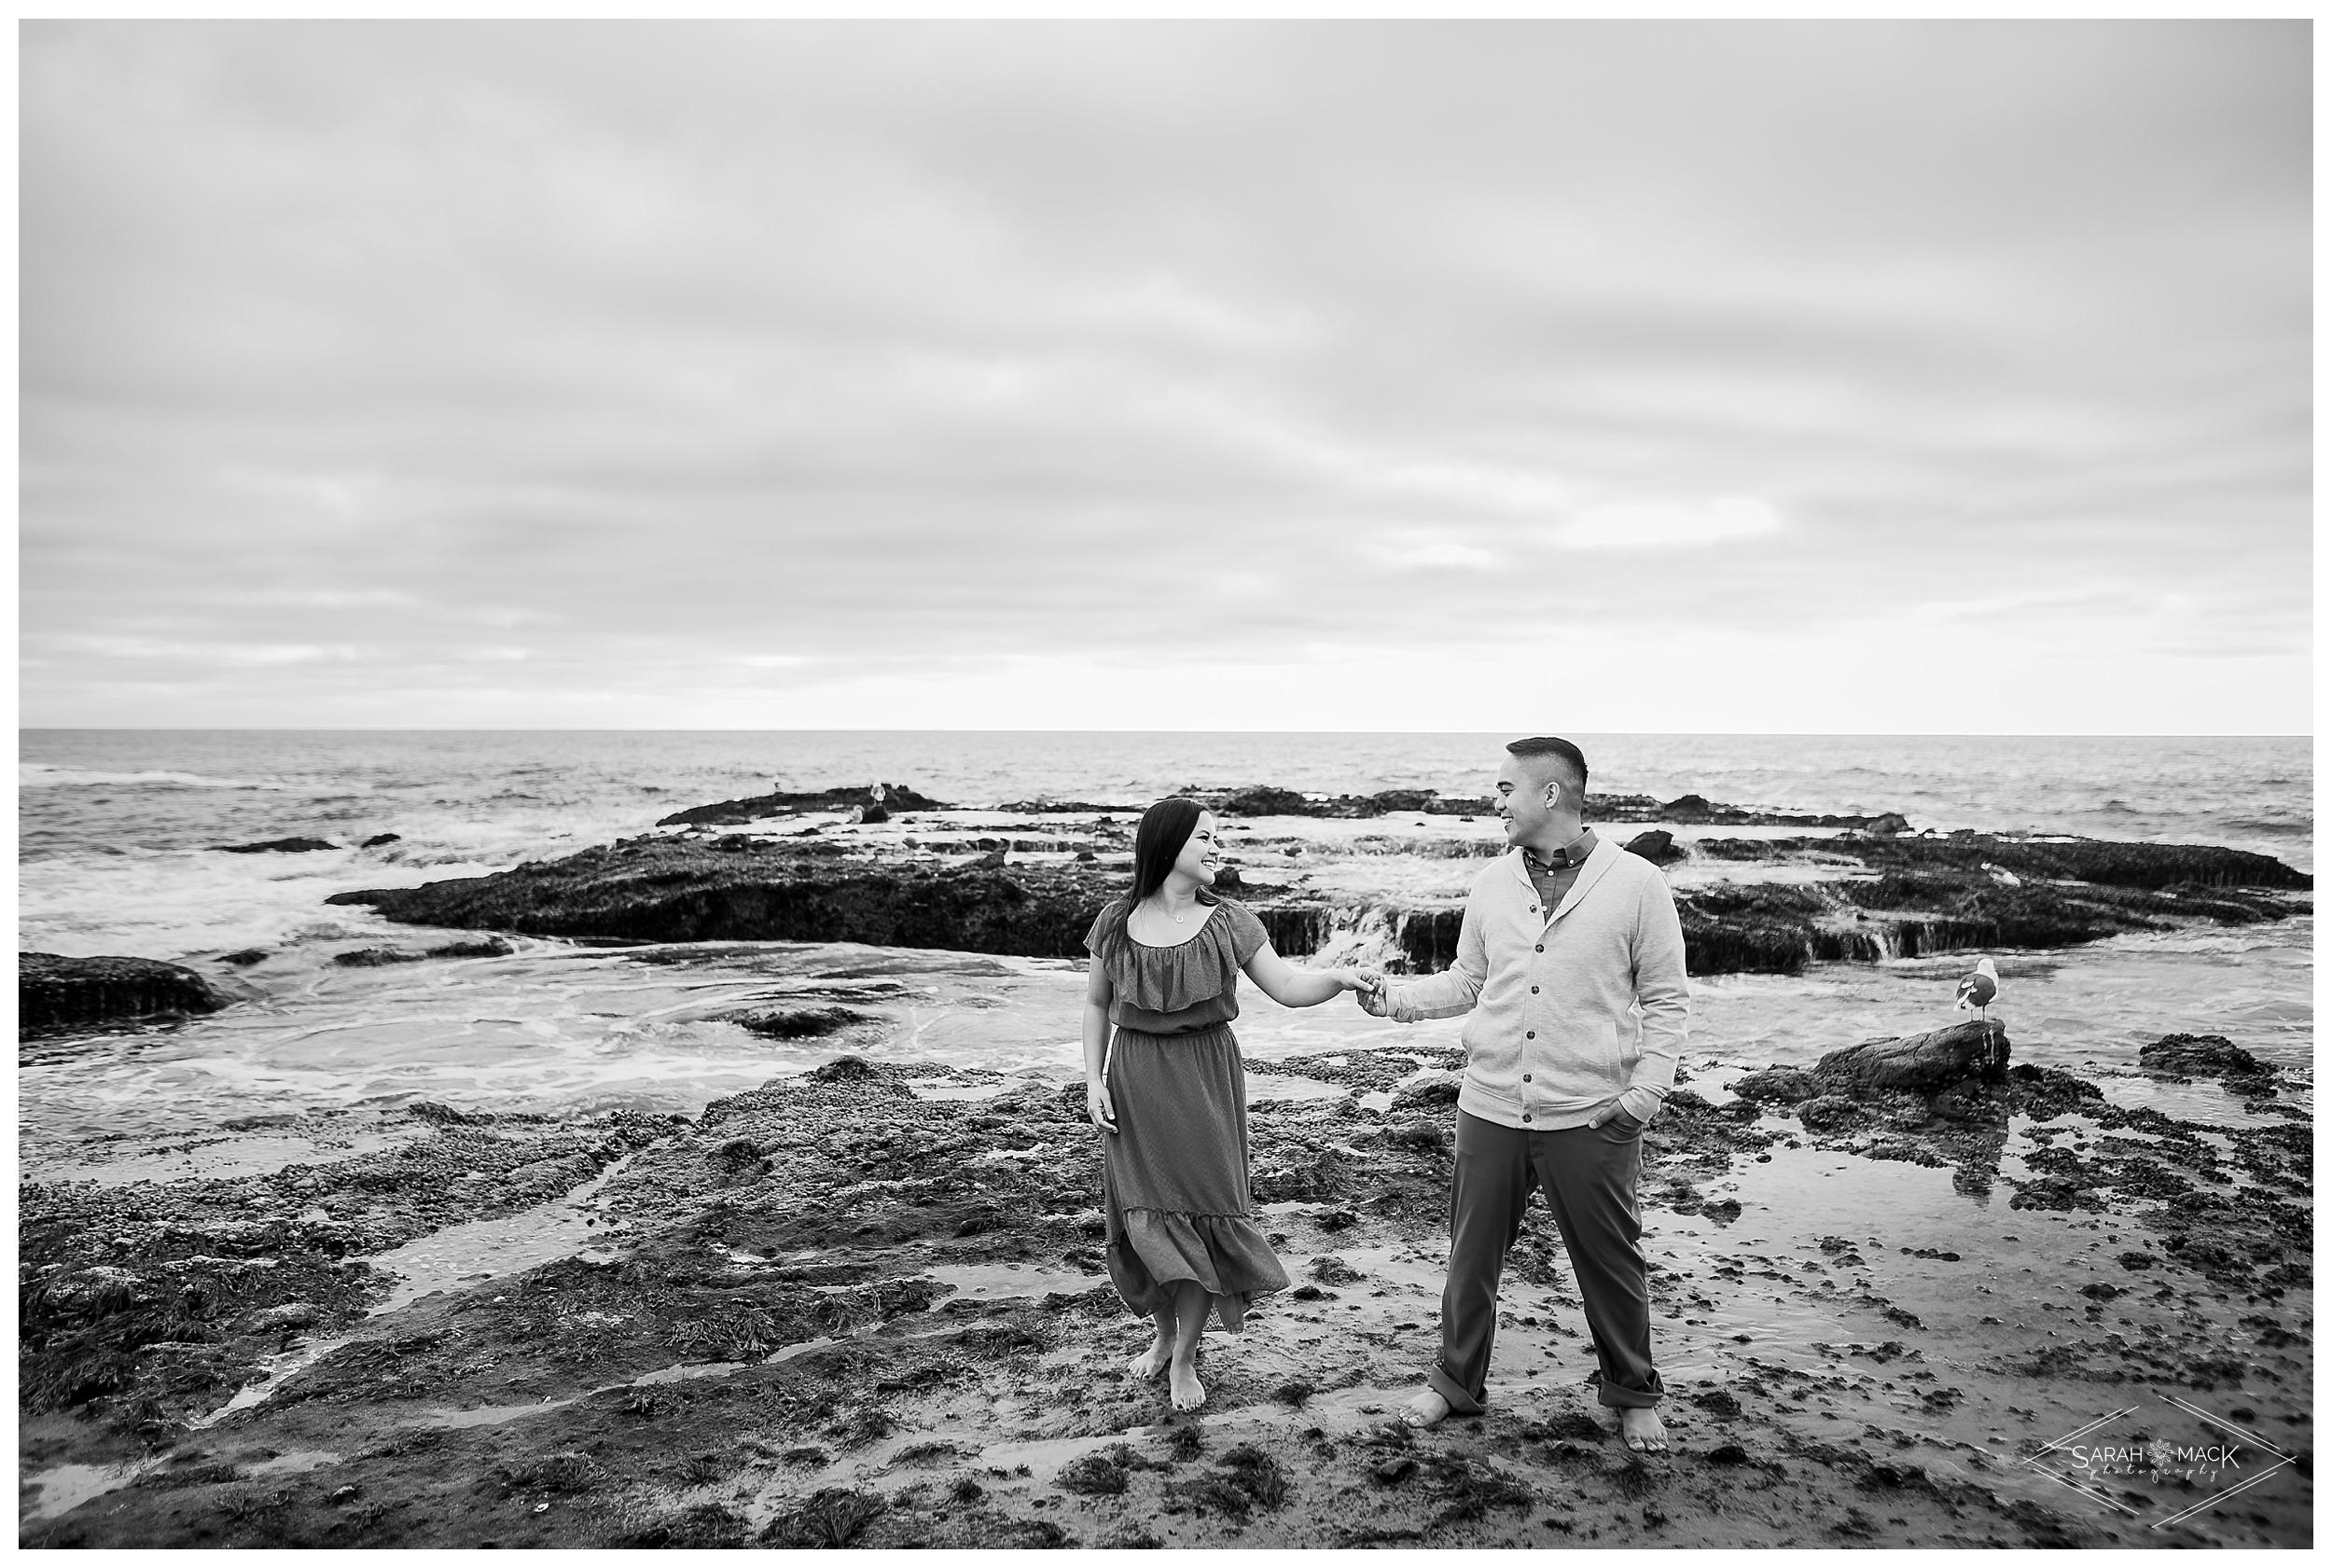 LE_Orange-County-Engagement-Photography 78-2.jpg